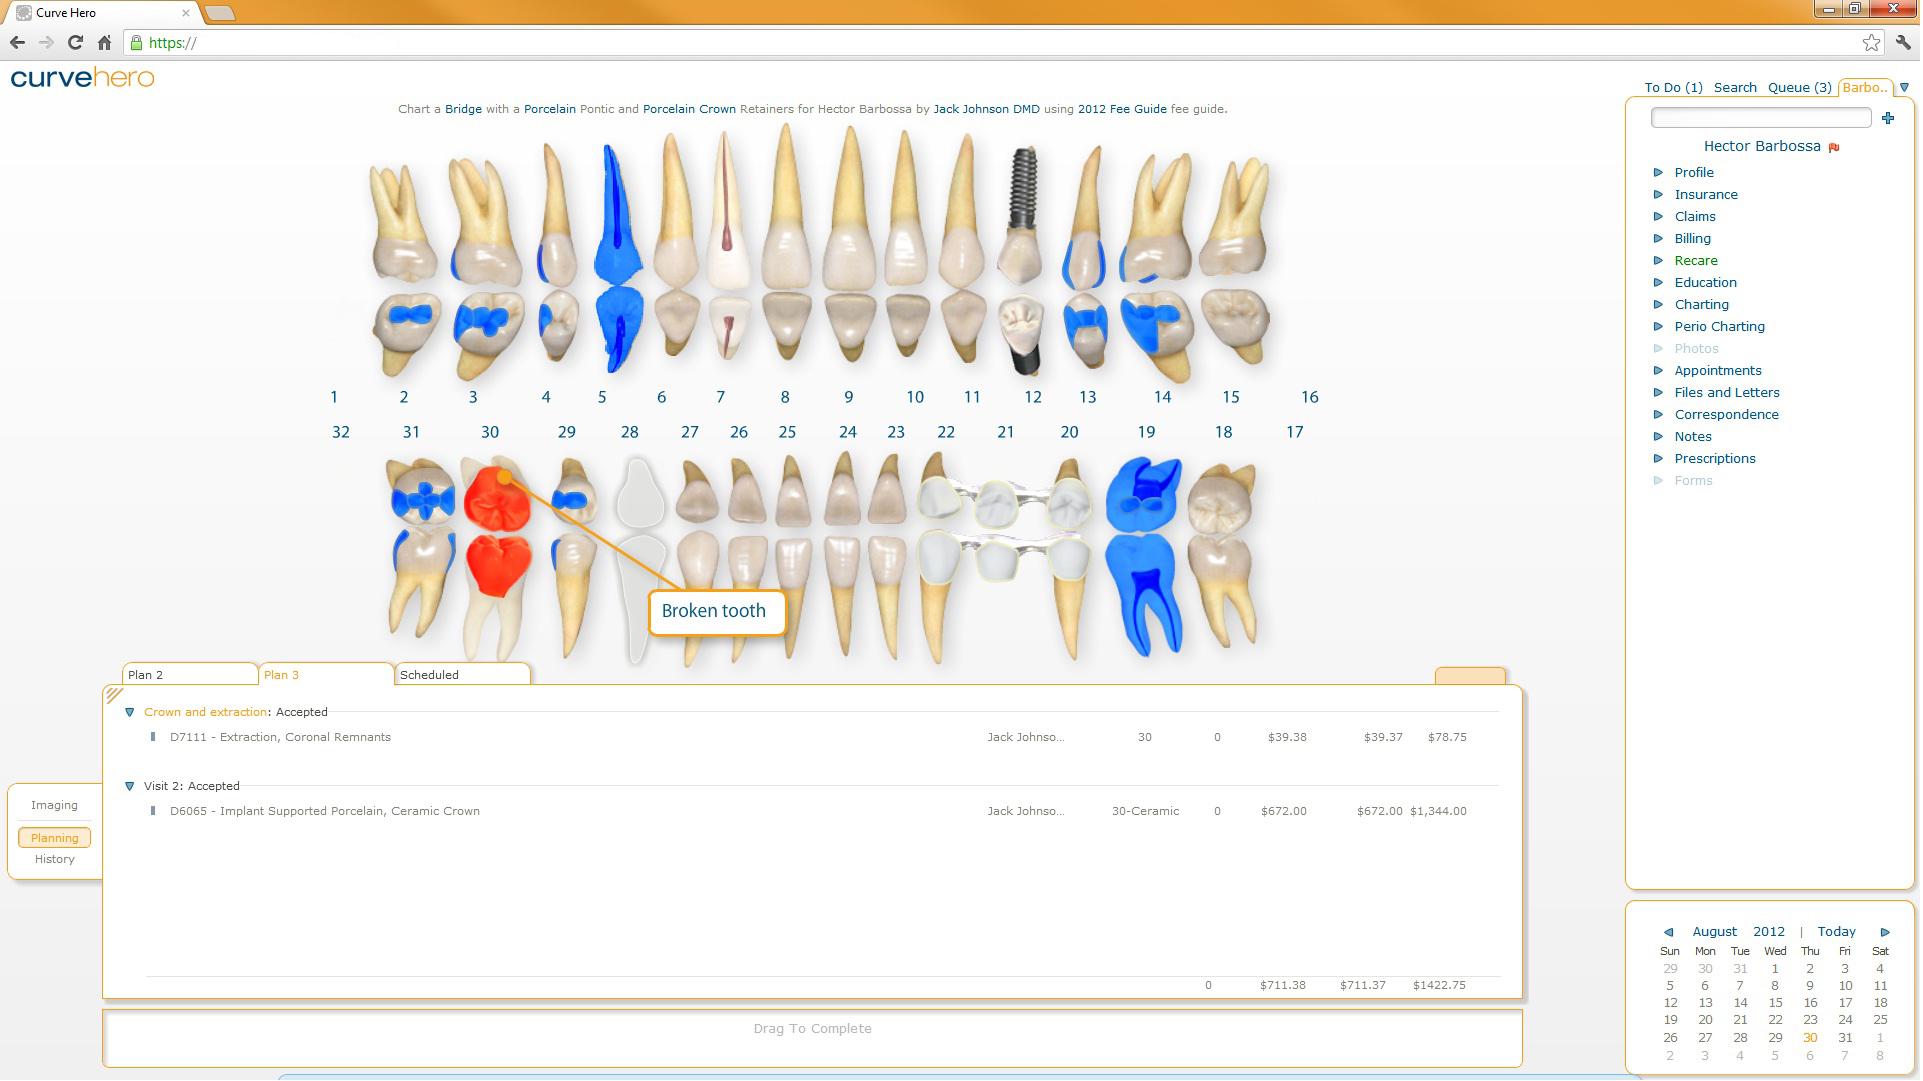 Curve Dental - Charts